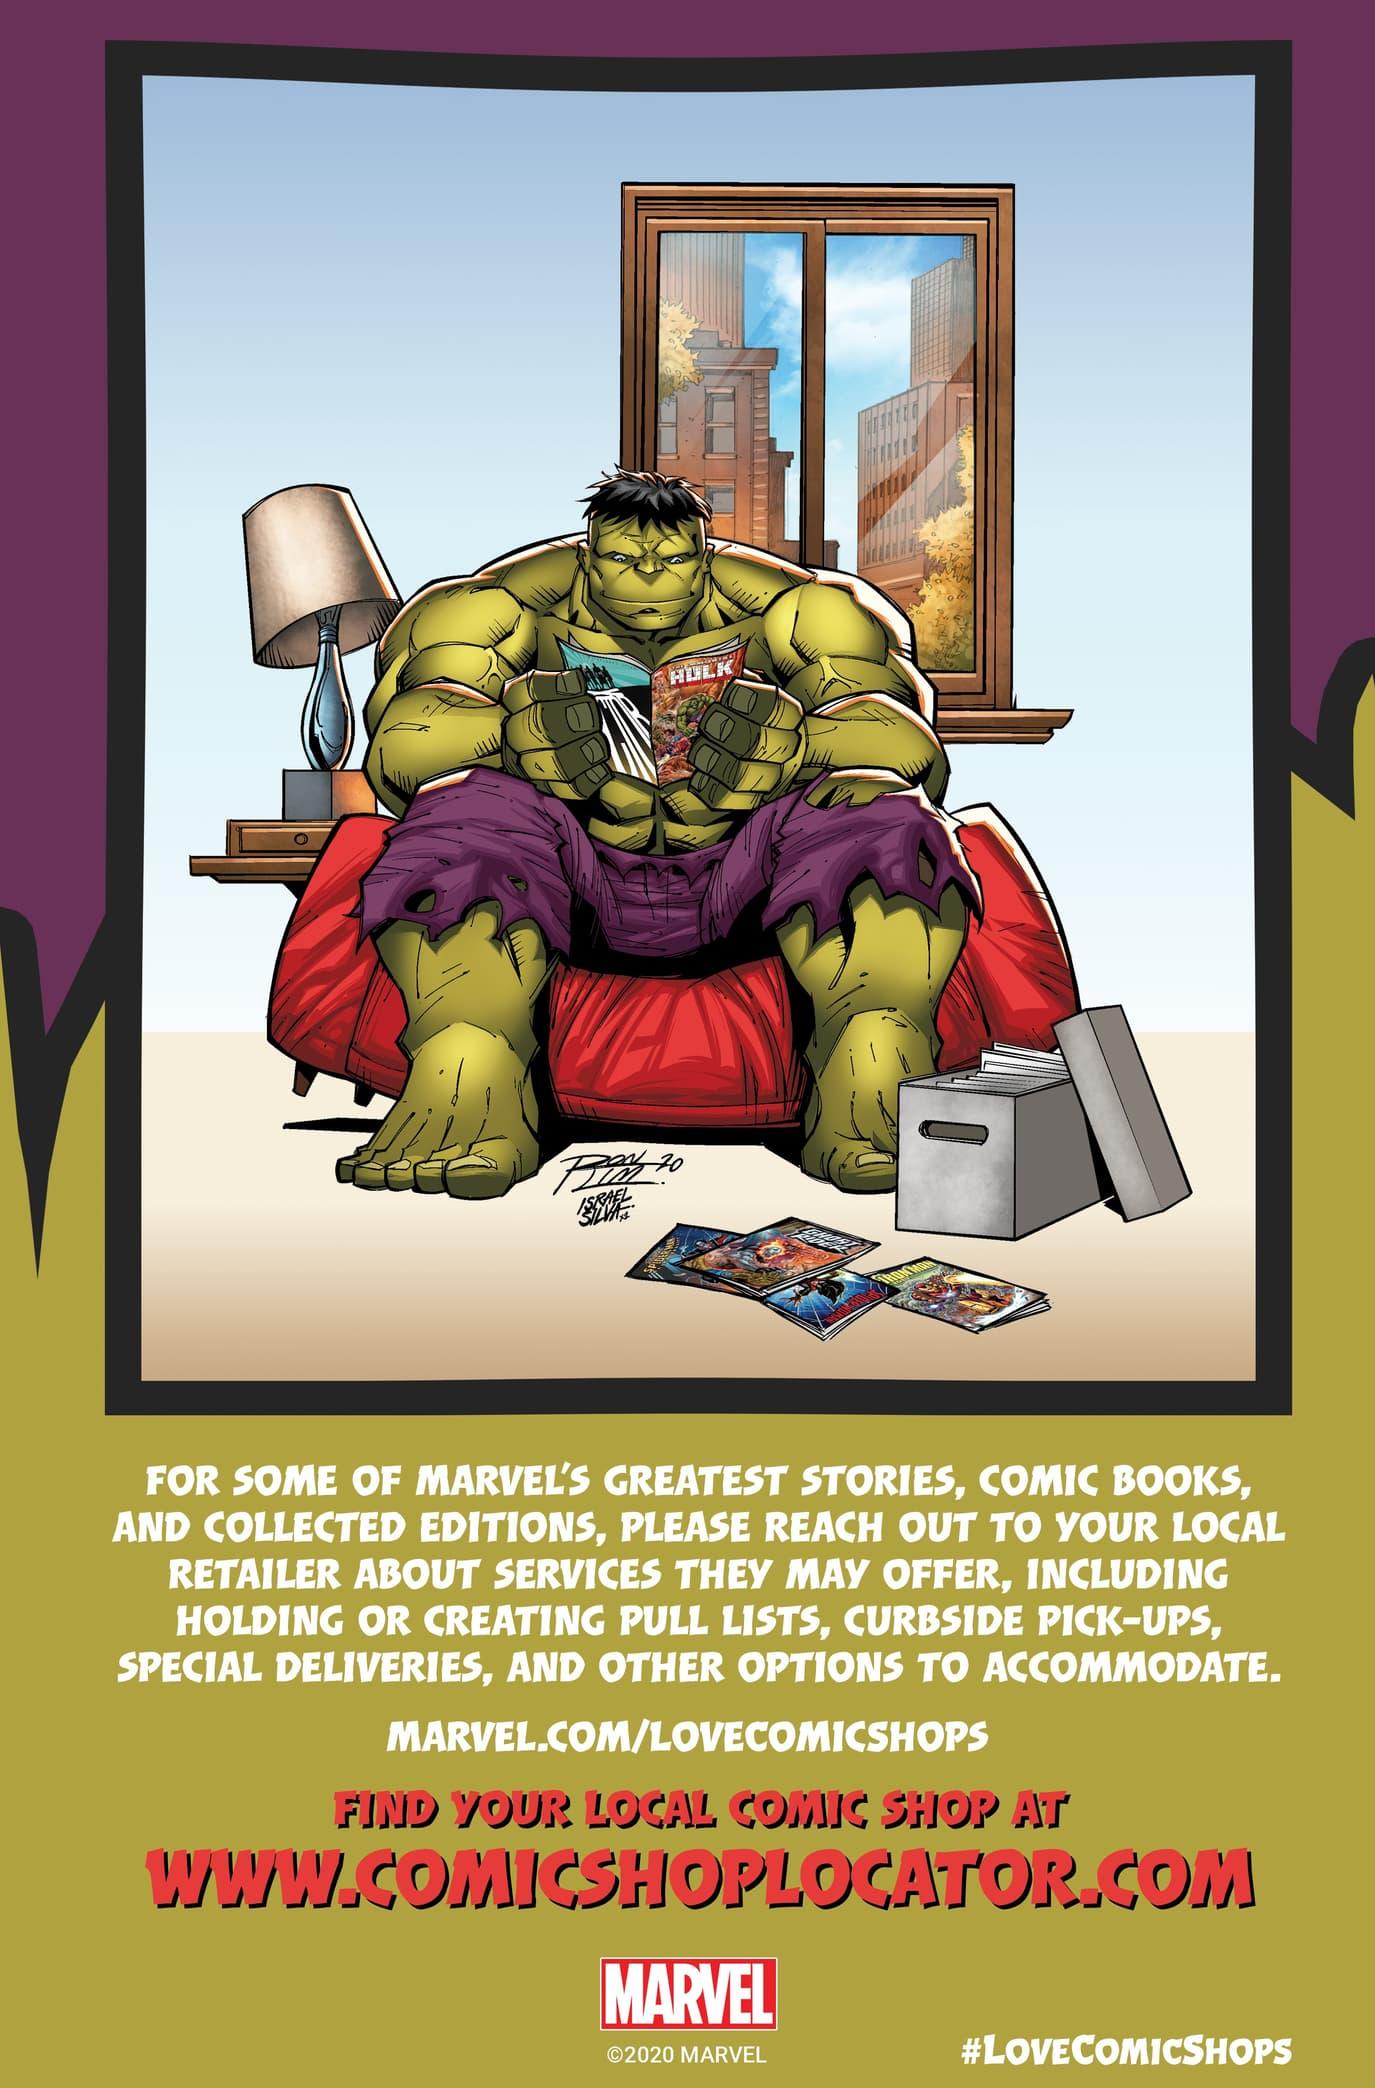 LCS_Hulk